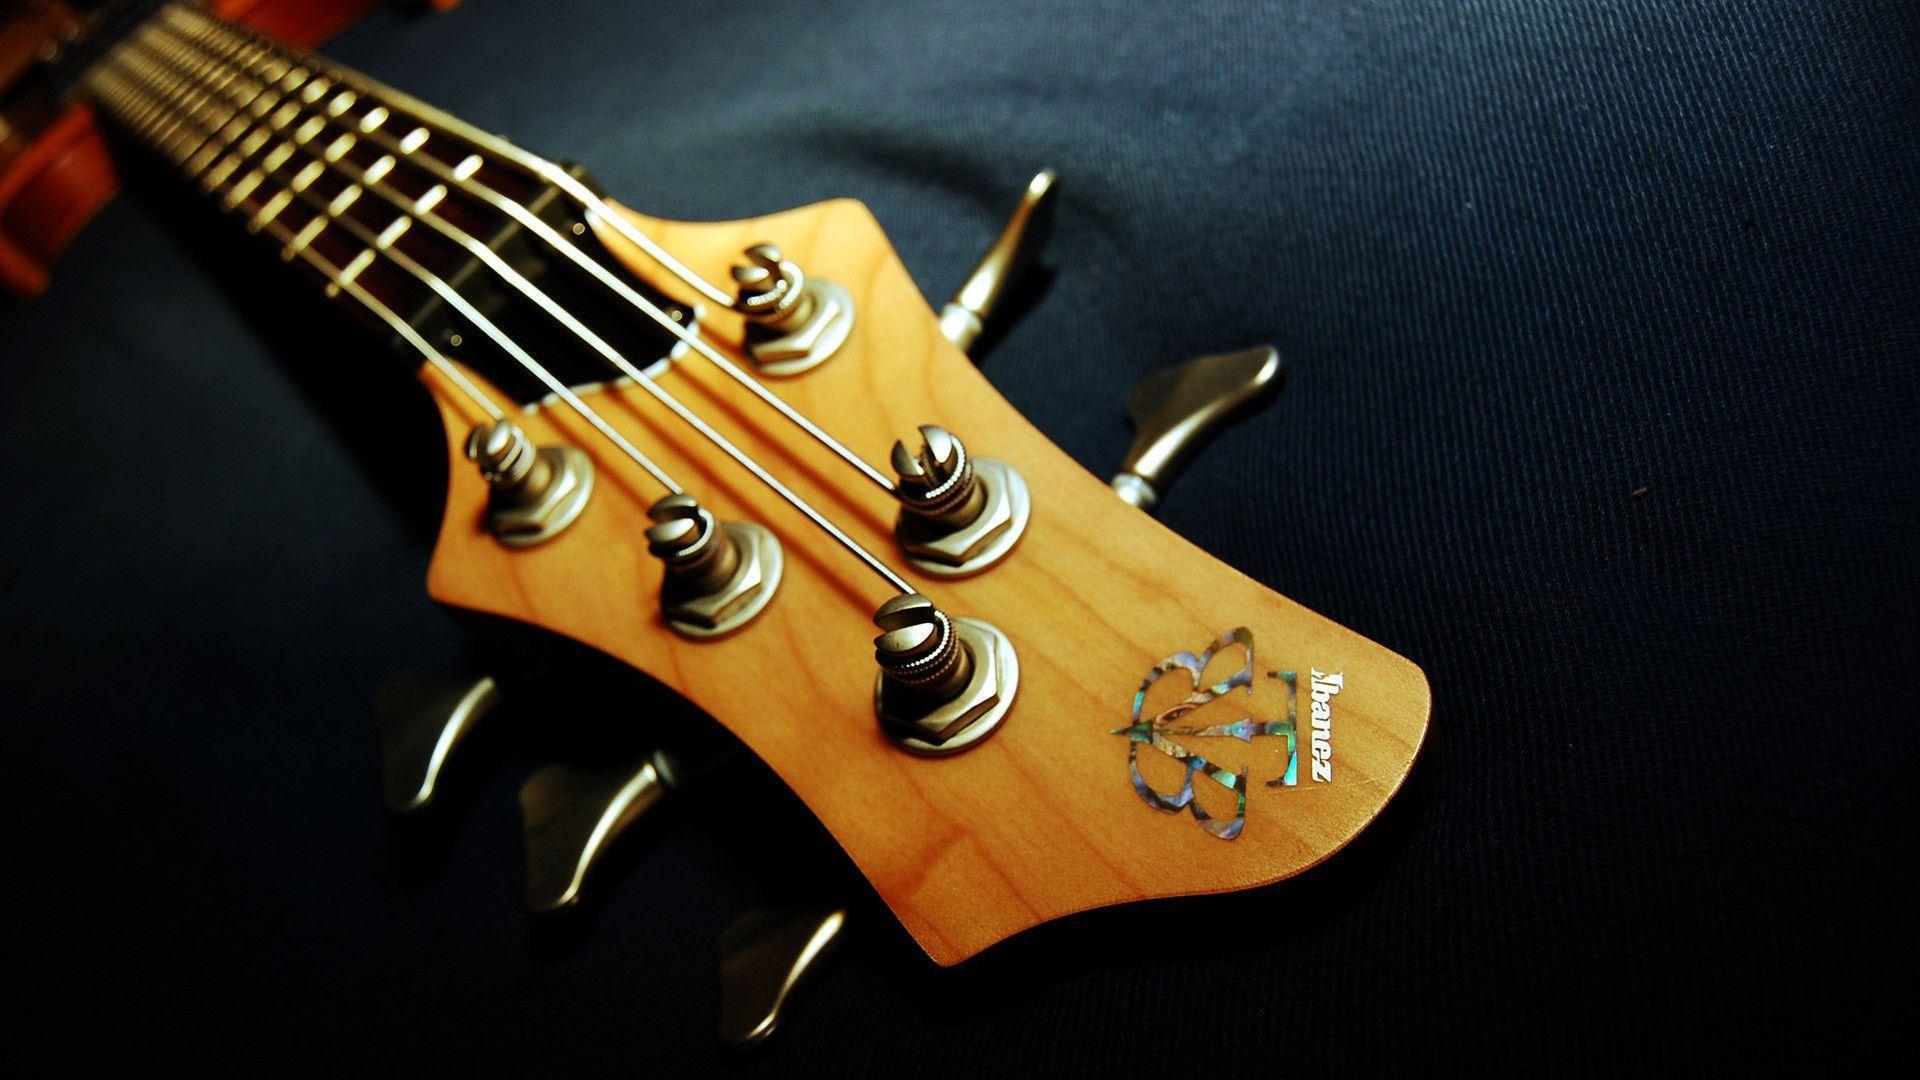 Ibanez Guitar Wallpaper: Ibanez Bass Guitar Wallpapers